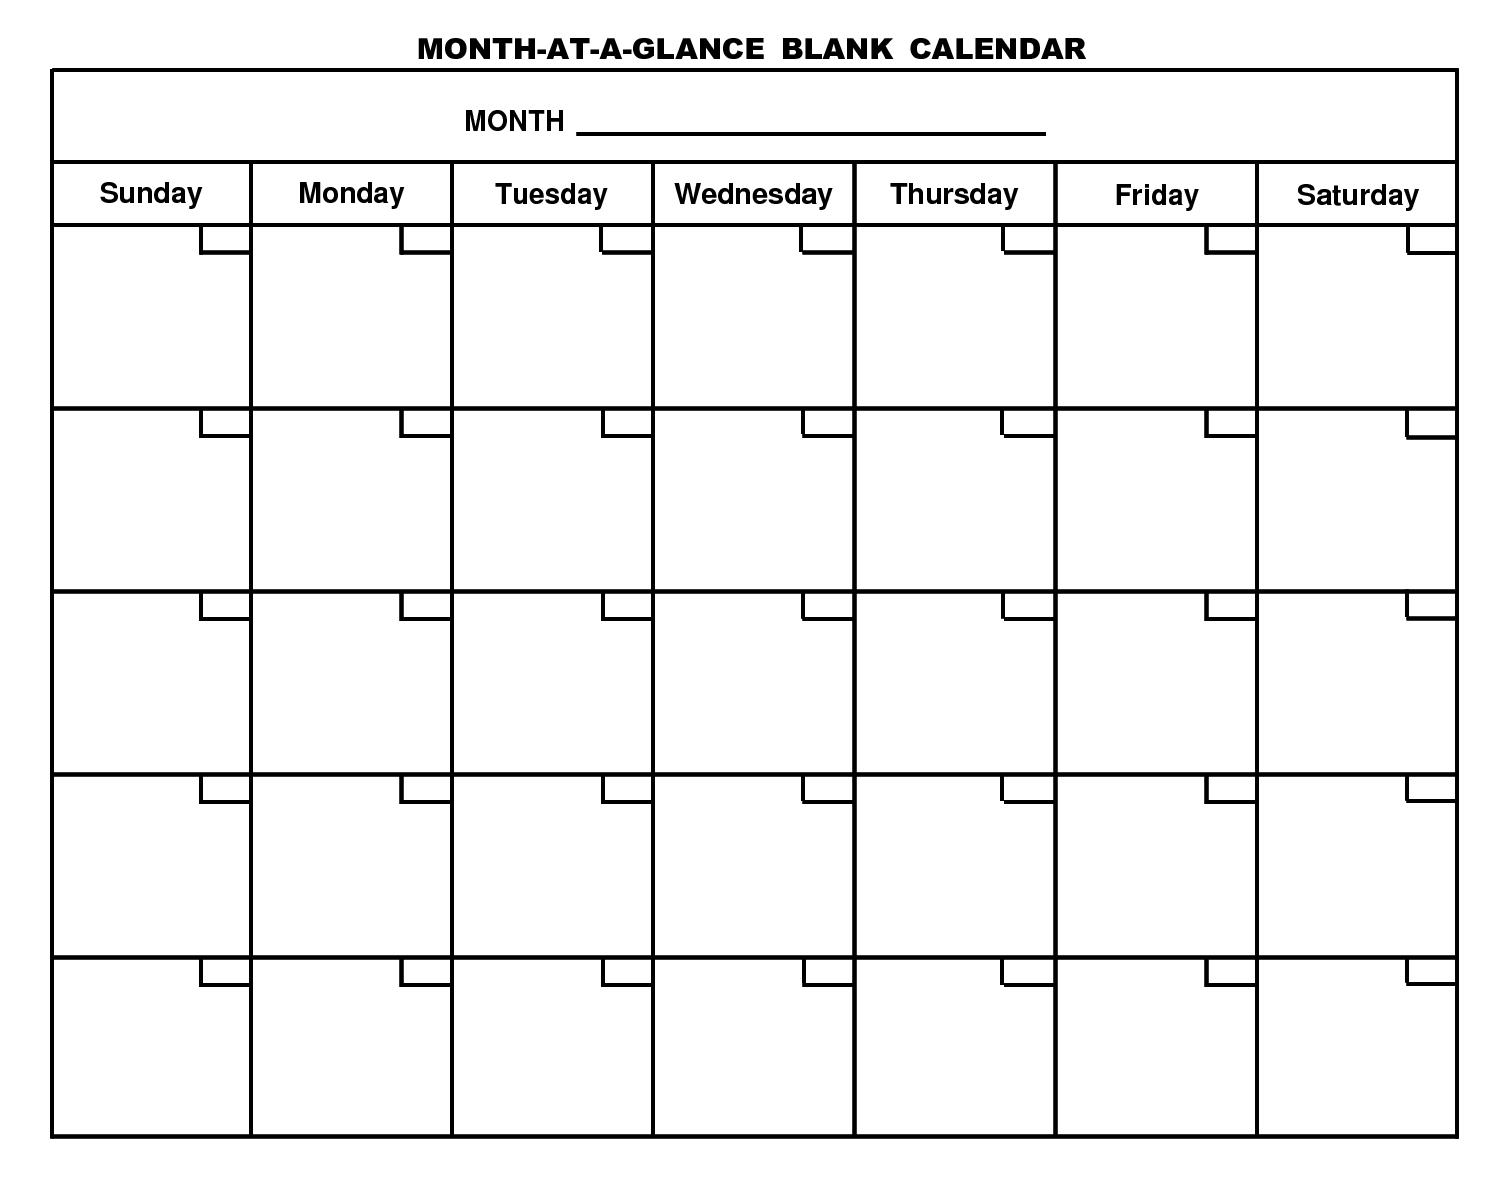 Printable Blank Calendar Template E2 80 A6 Organizing Pinte Free pertaining to Blank Calendar Template With Lines